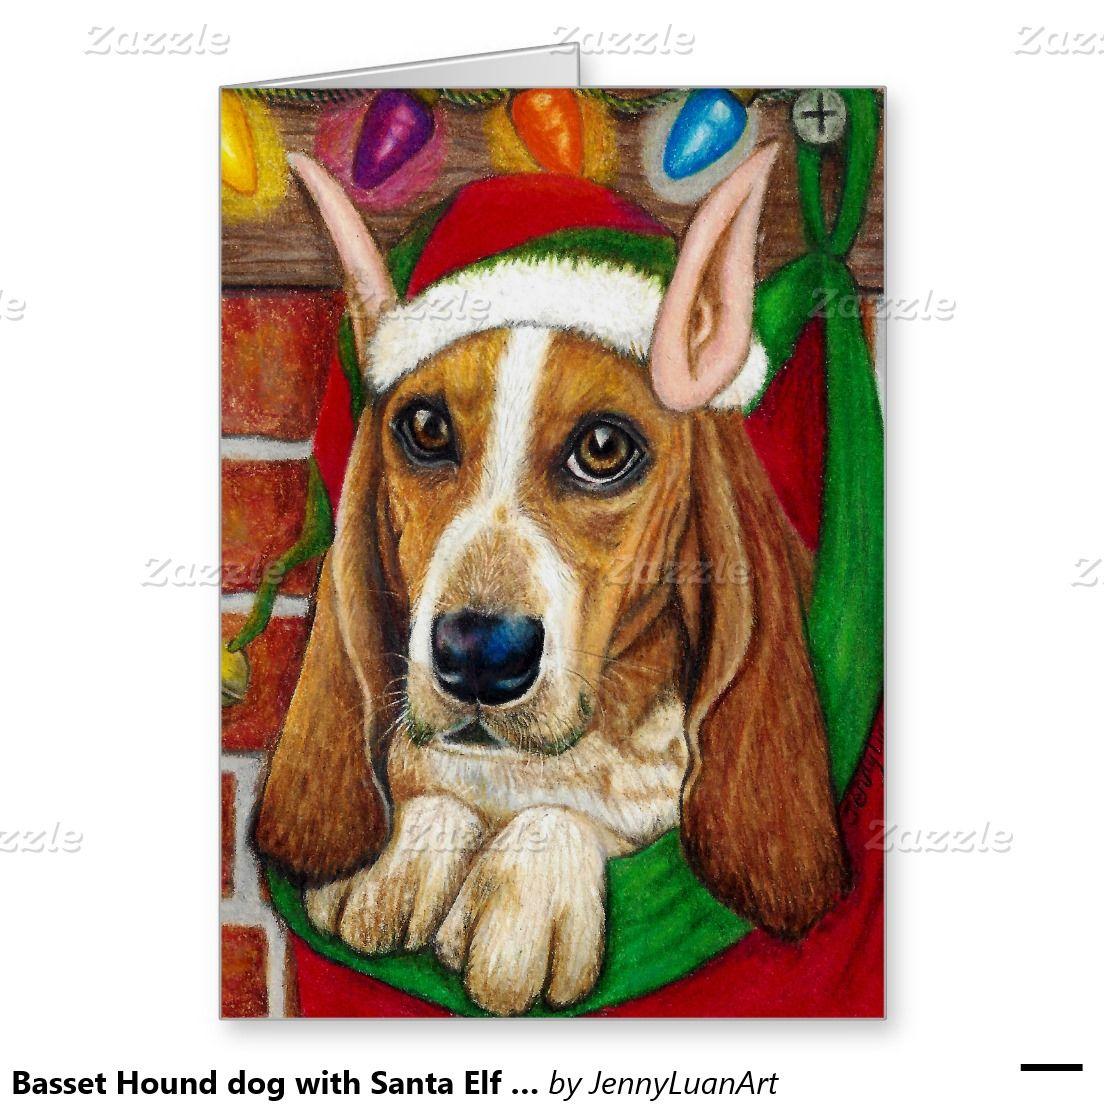 Basset Hound dog with Santa Elf Ear in Stocking Holiday Card ...